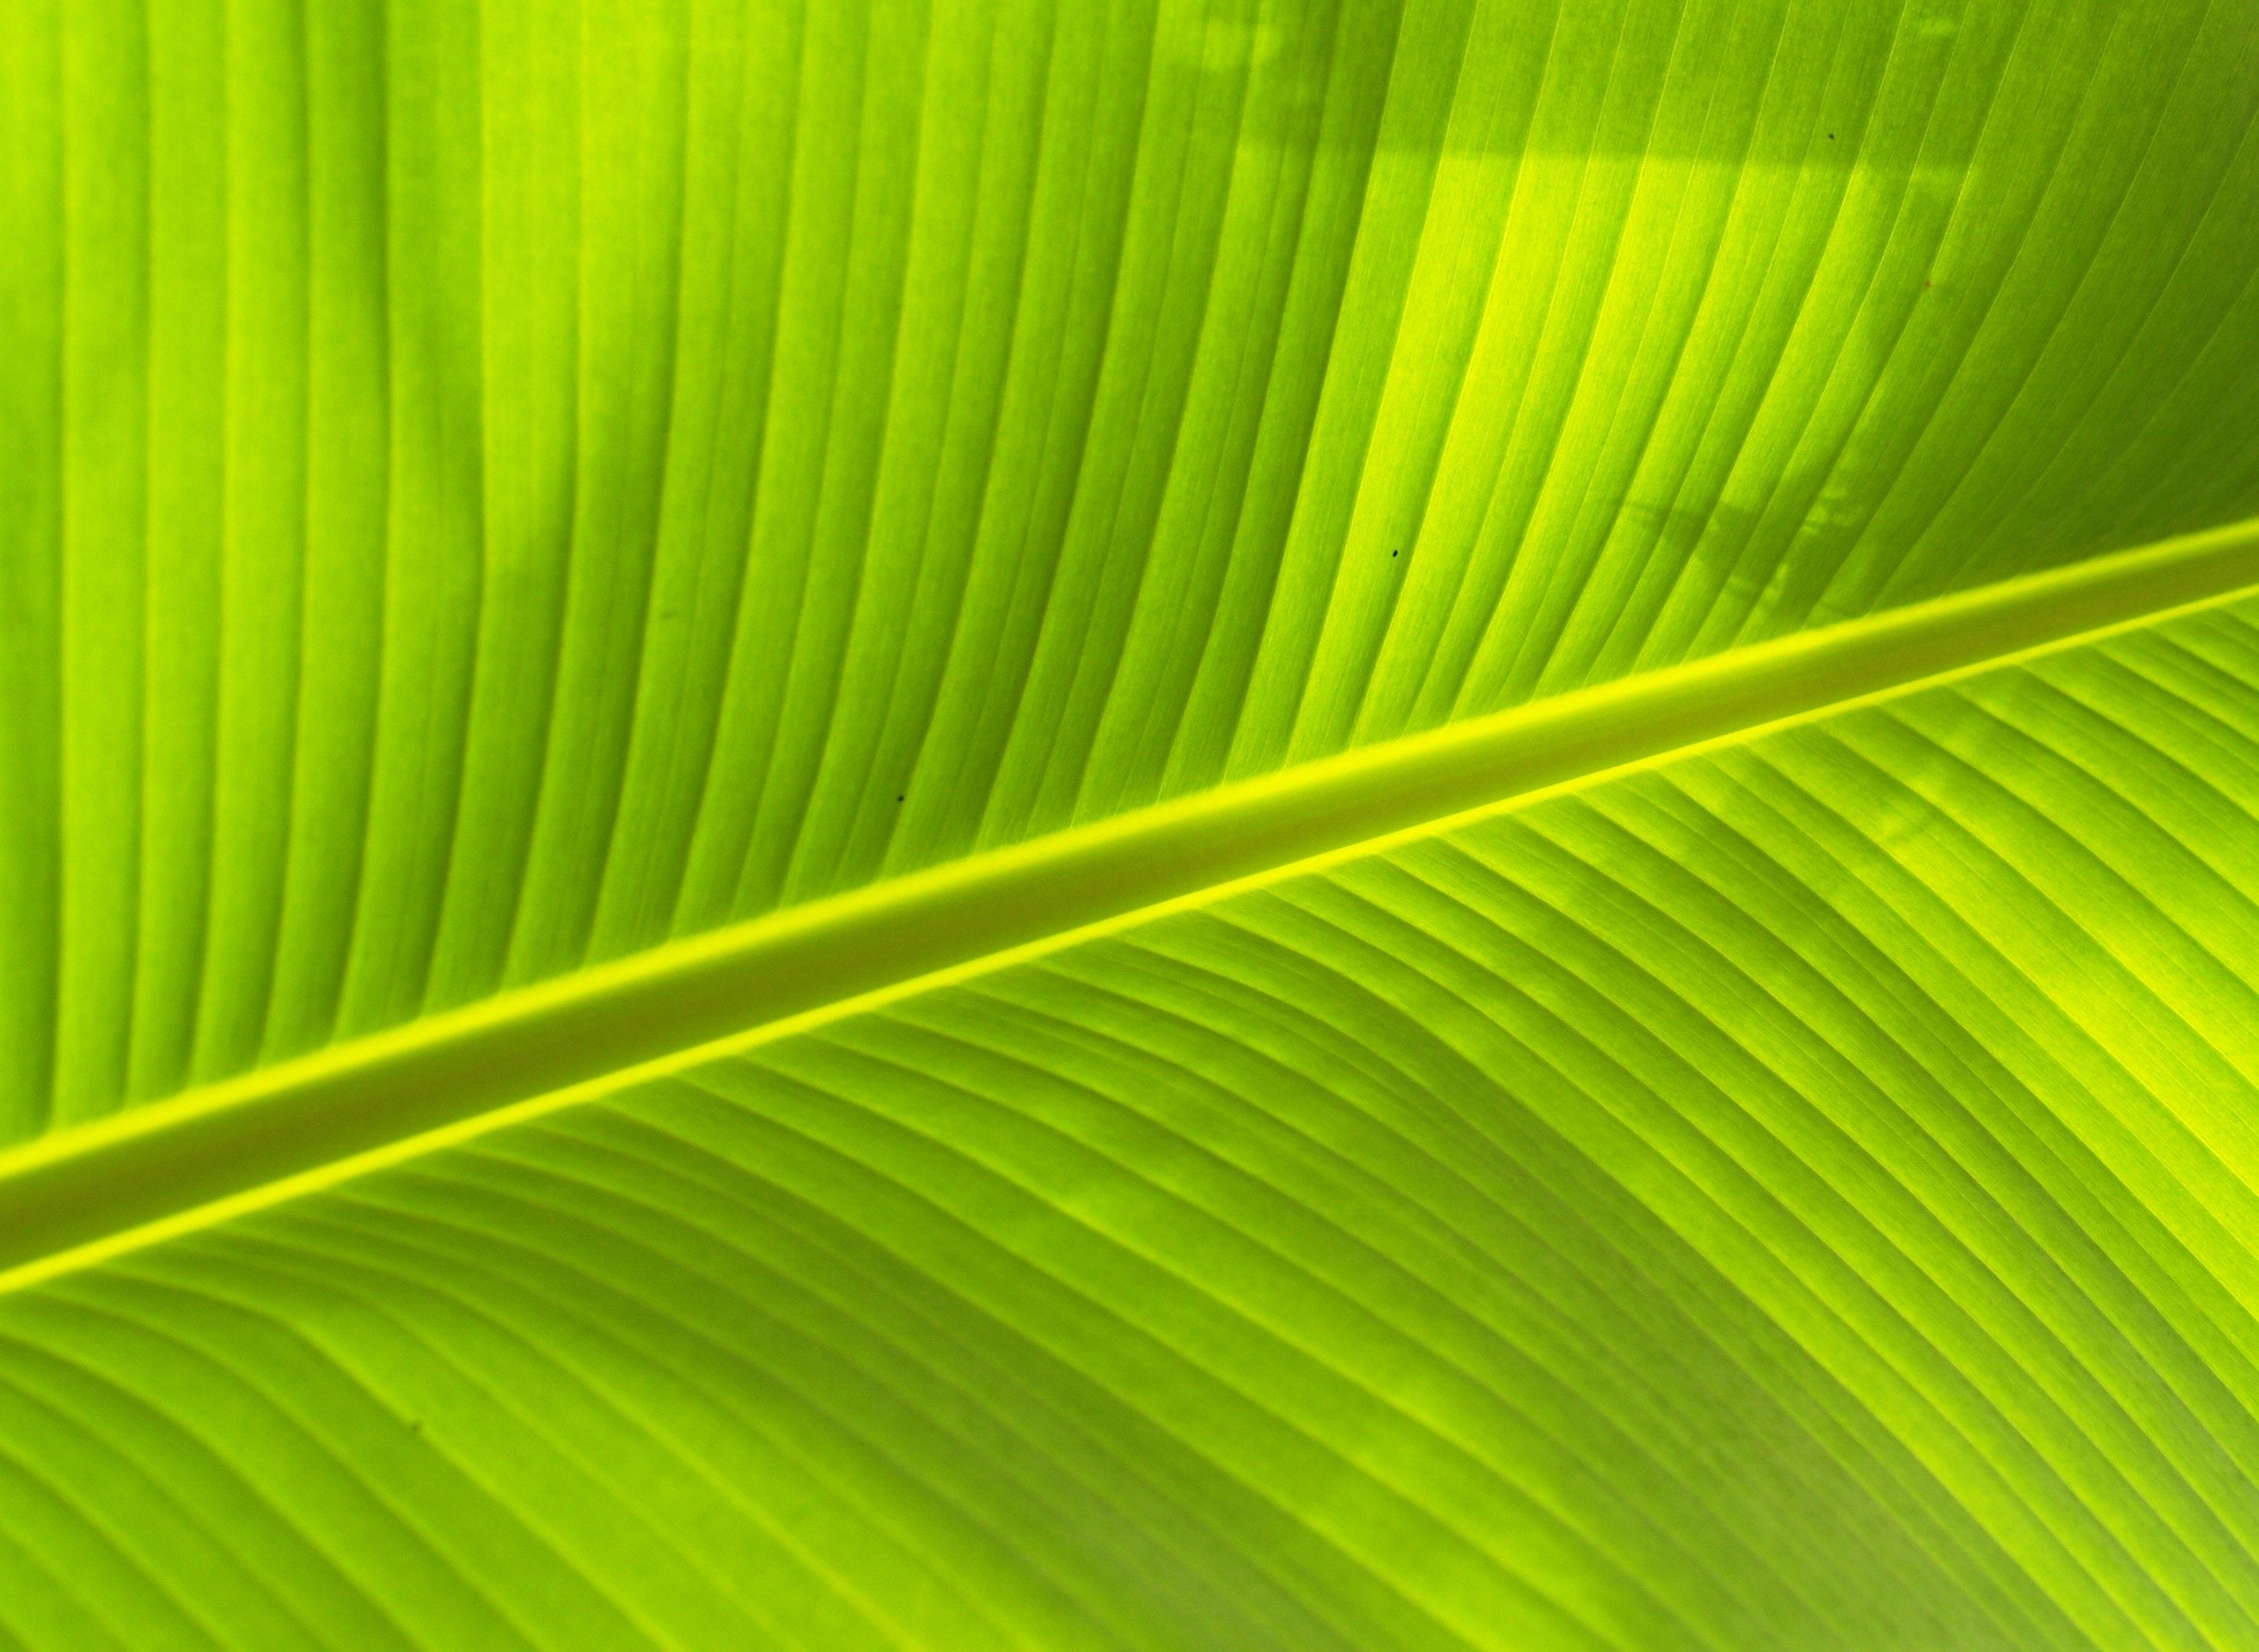 Free stock photo of background, banana leaves, element